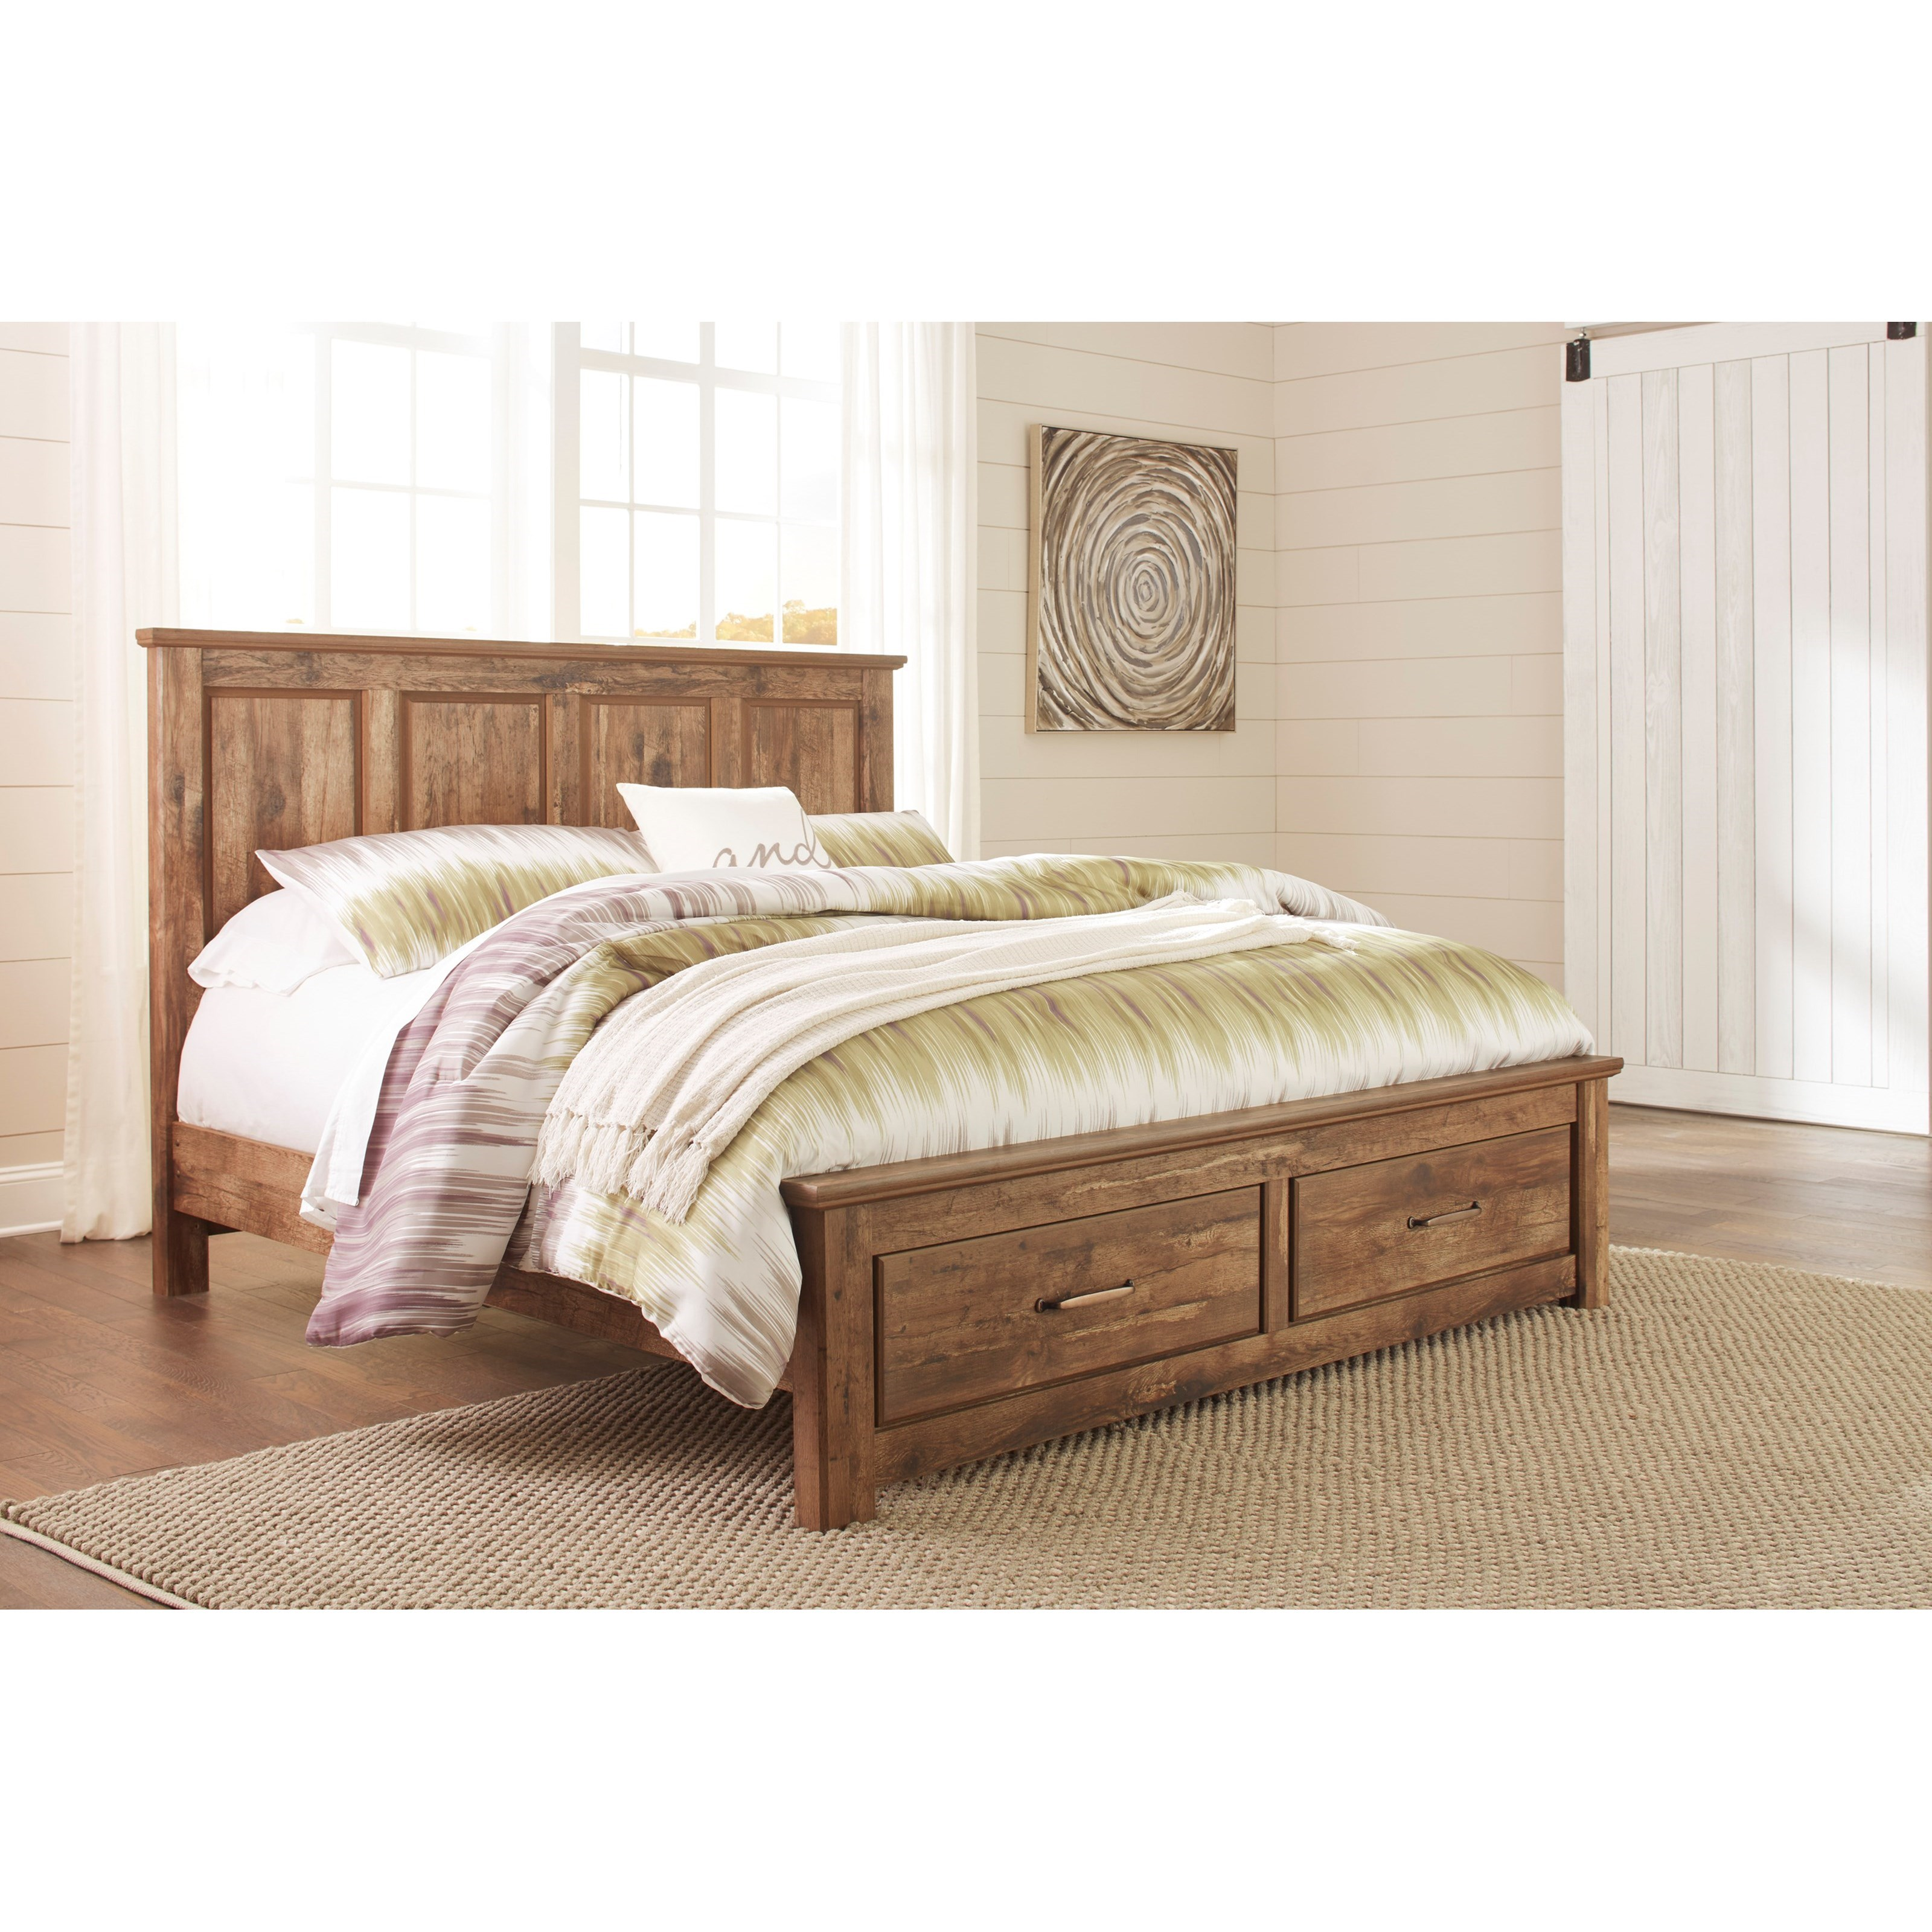 Ashley signature design blaneville king panel storage bed dunk bright furniture platform - Ashley furniture platform beds ...